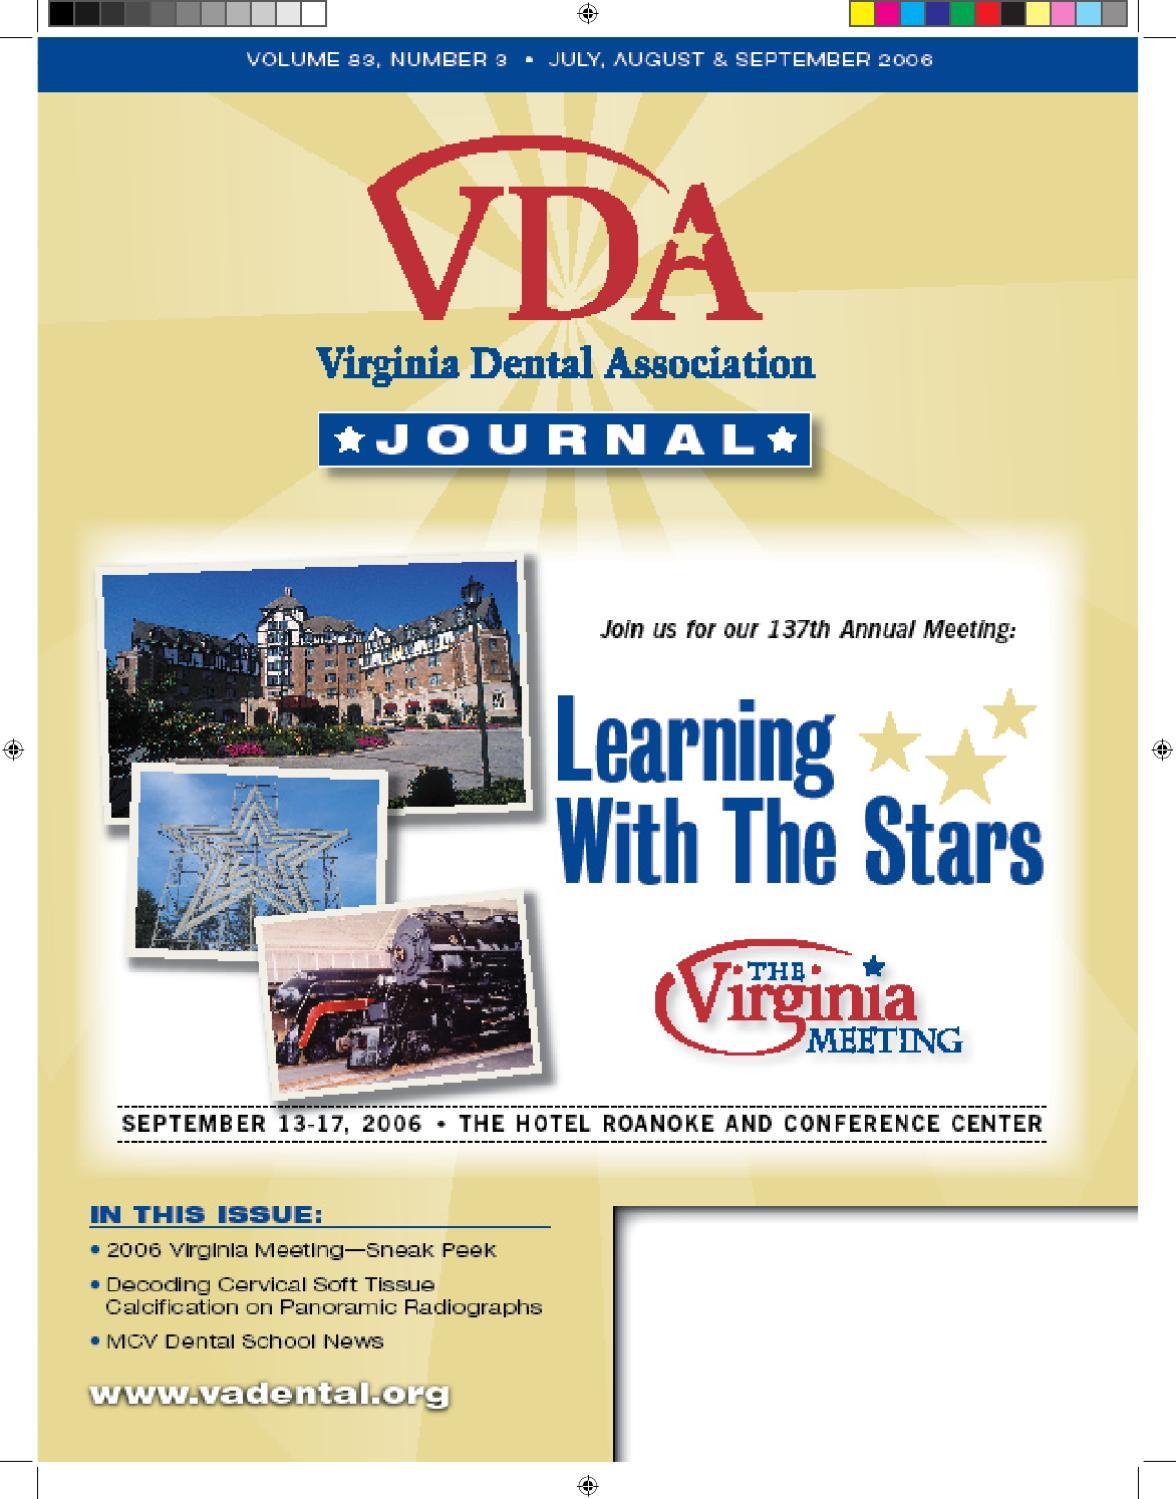 Virginia Dental Journal by Virginia Dental Association - issuu